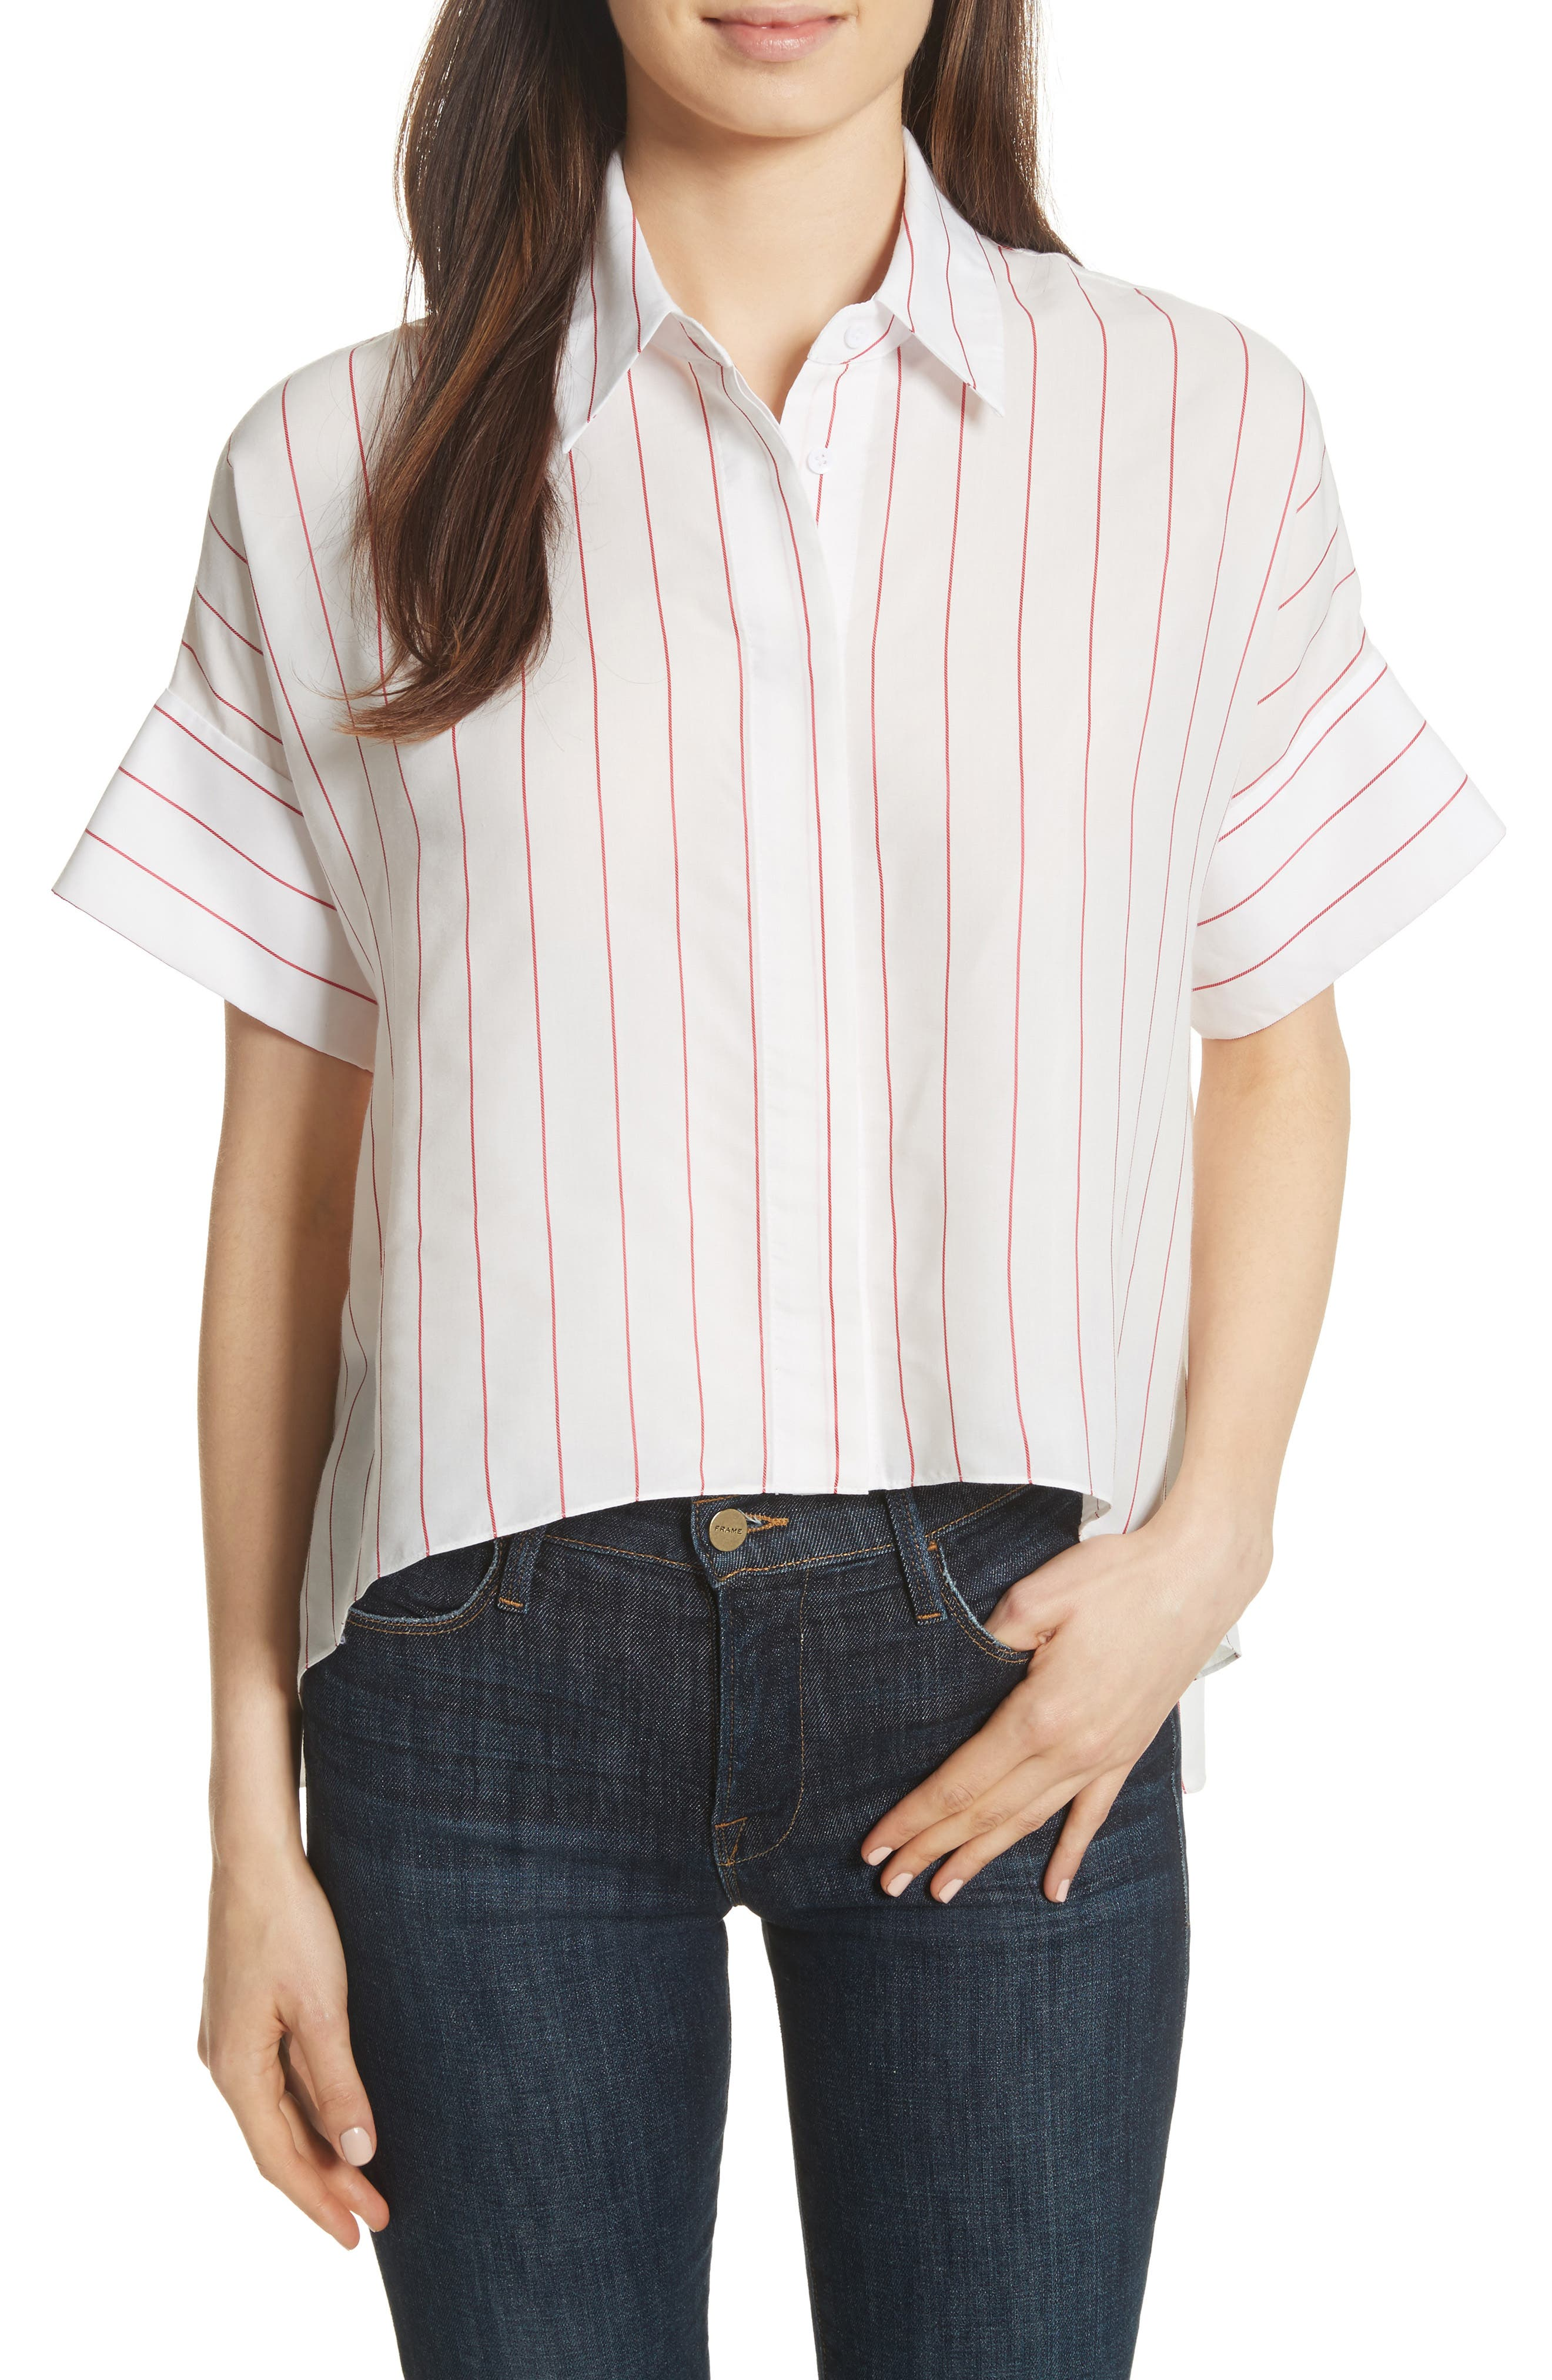 Edyth High/Low Button Down Shirt,                             Main thumbnail 1, color,                             White/ Red